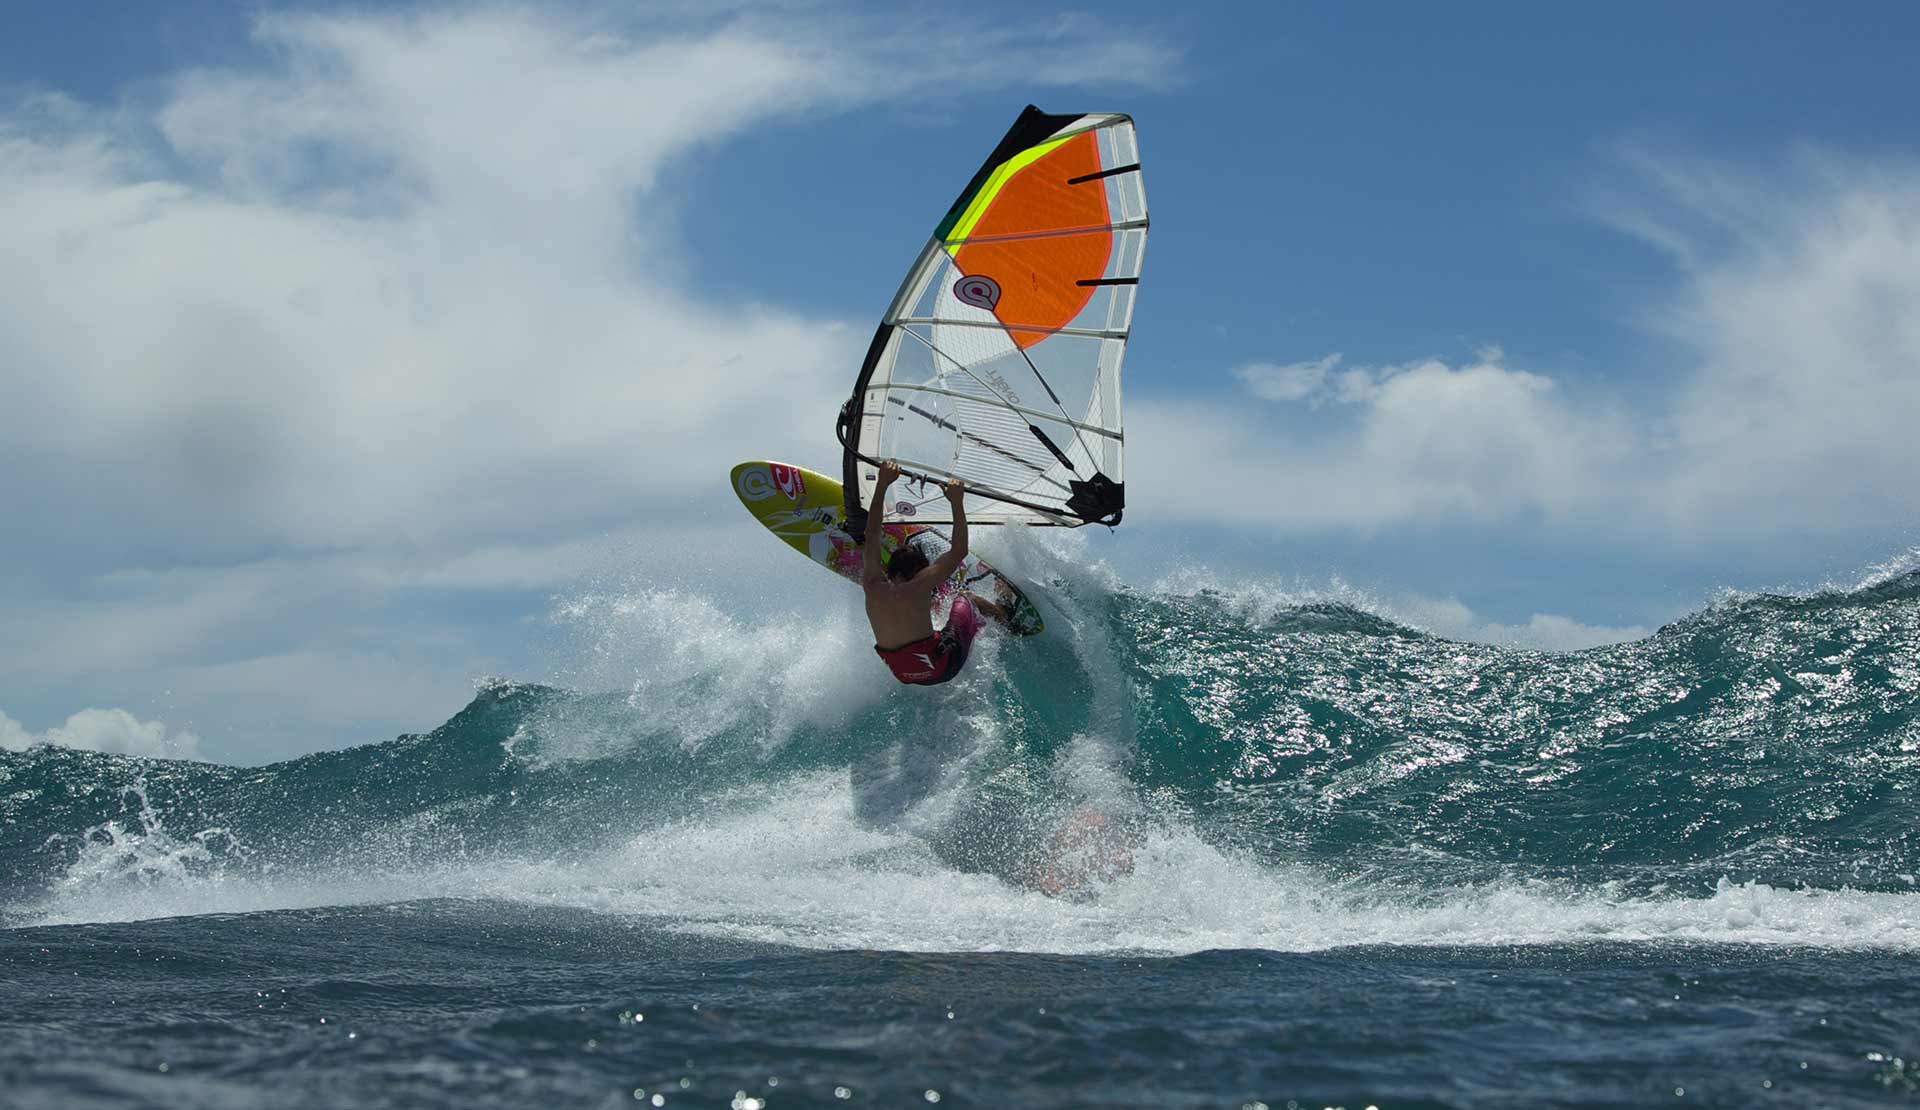 Jericoacoara windsurfing